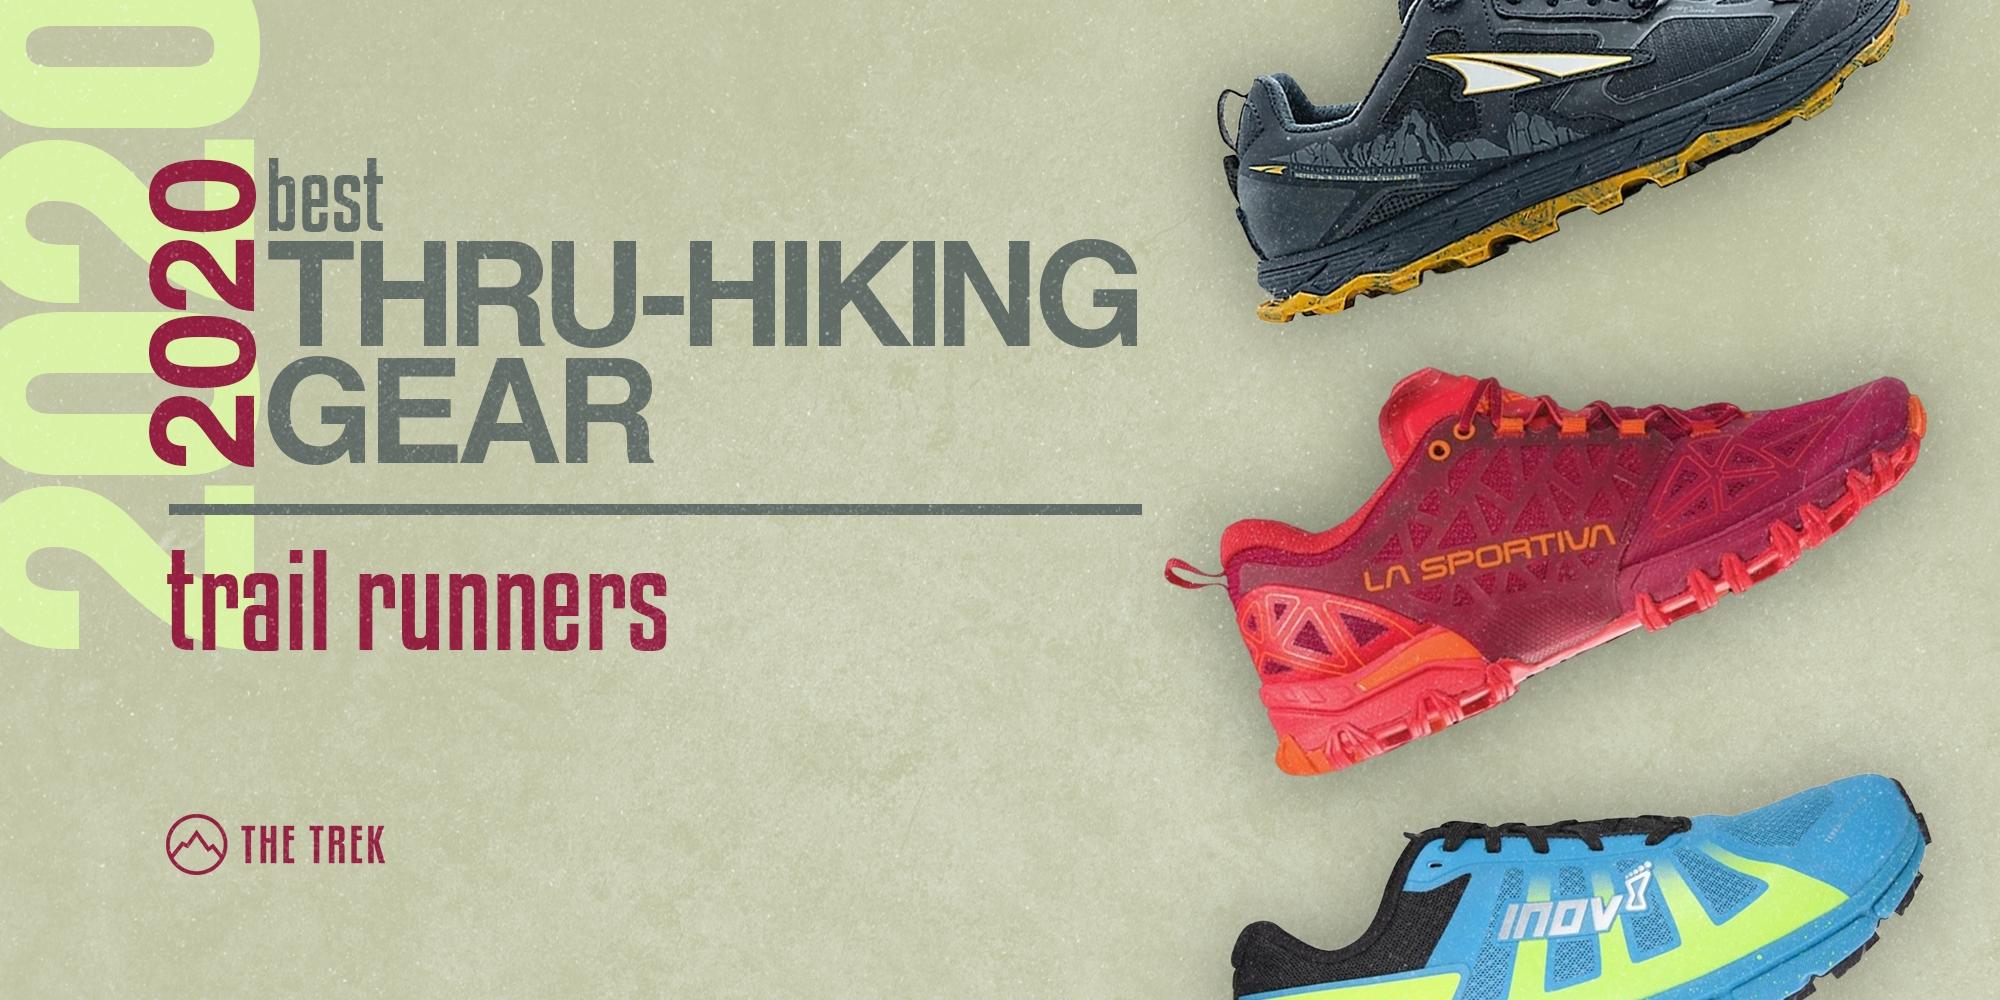 Best Trail Runners for Thru-Hiking